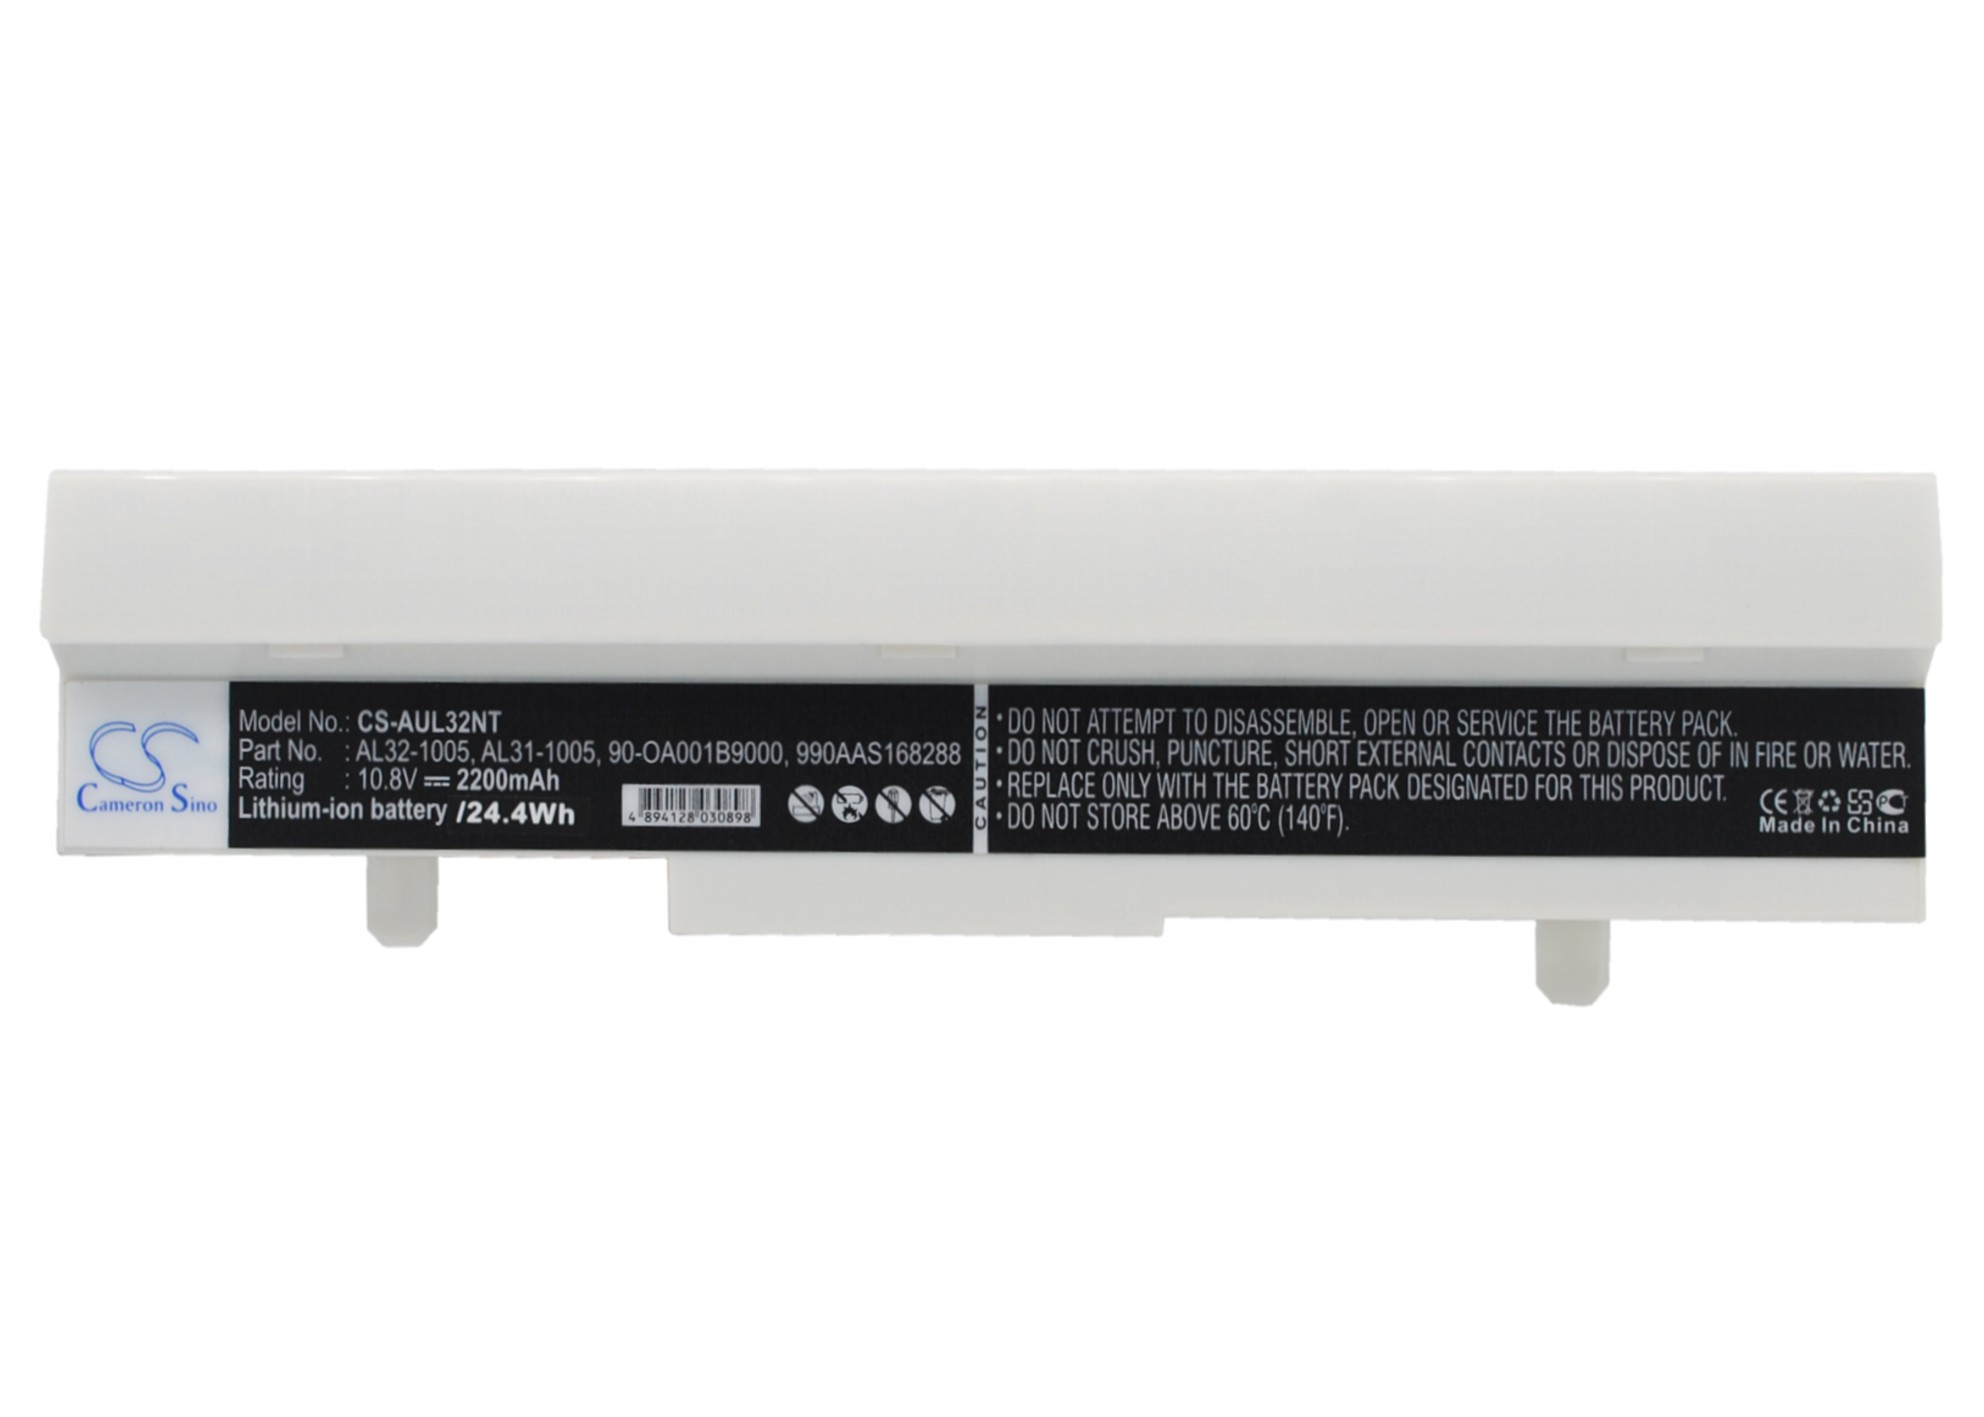 Cameron Sino baterie do netbooků pro ASUS Eee PC 1005PE 10.8V Li-ion 2200mAh bílá - neoriginální